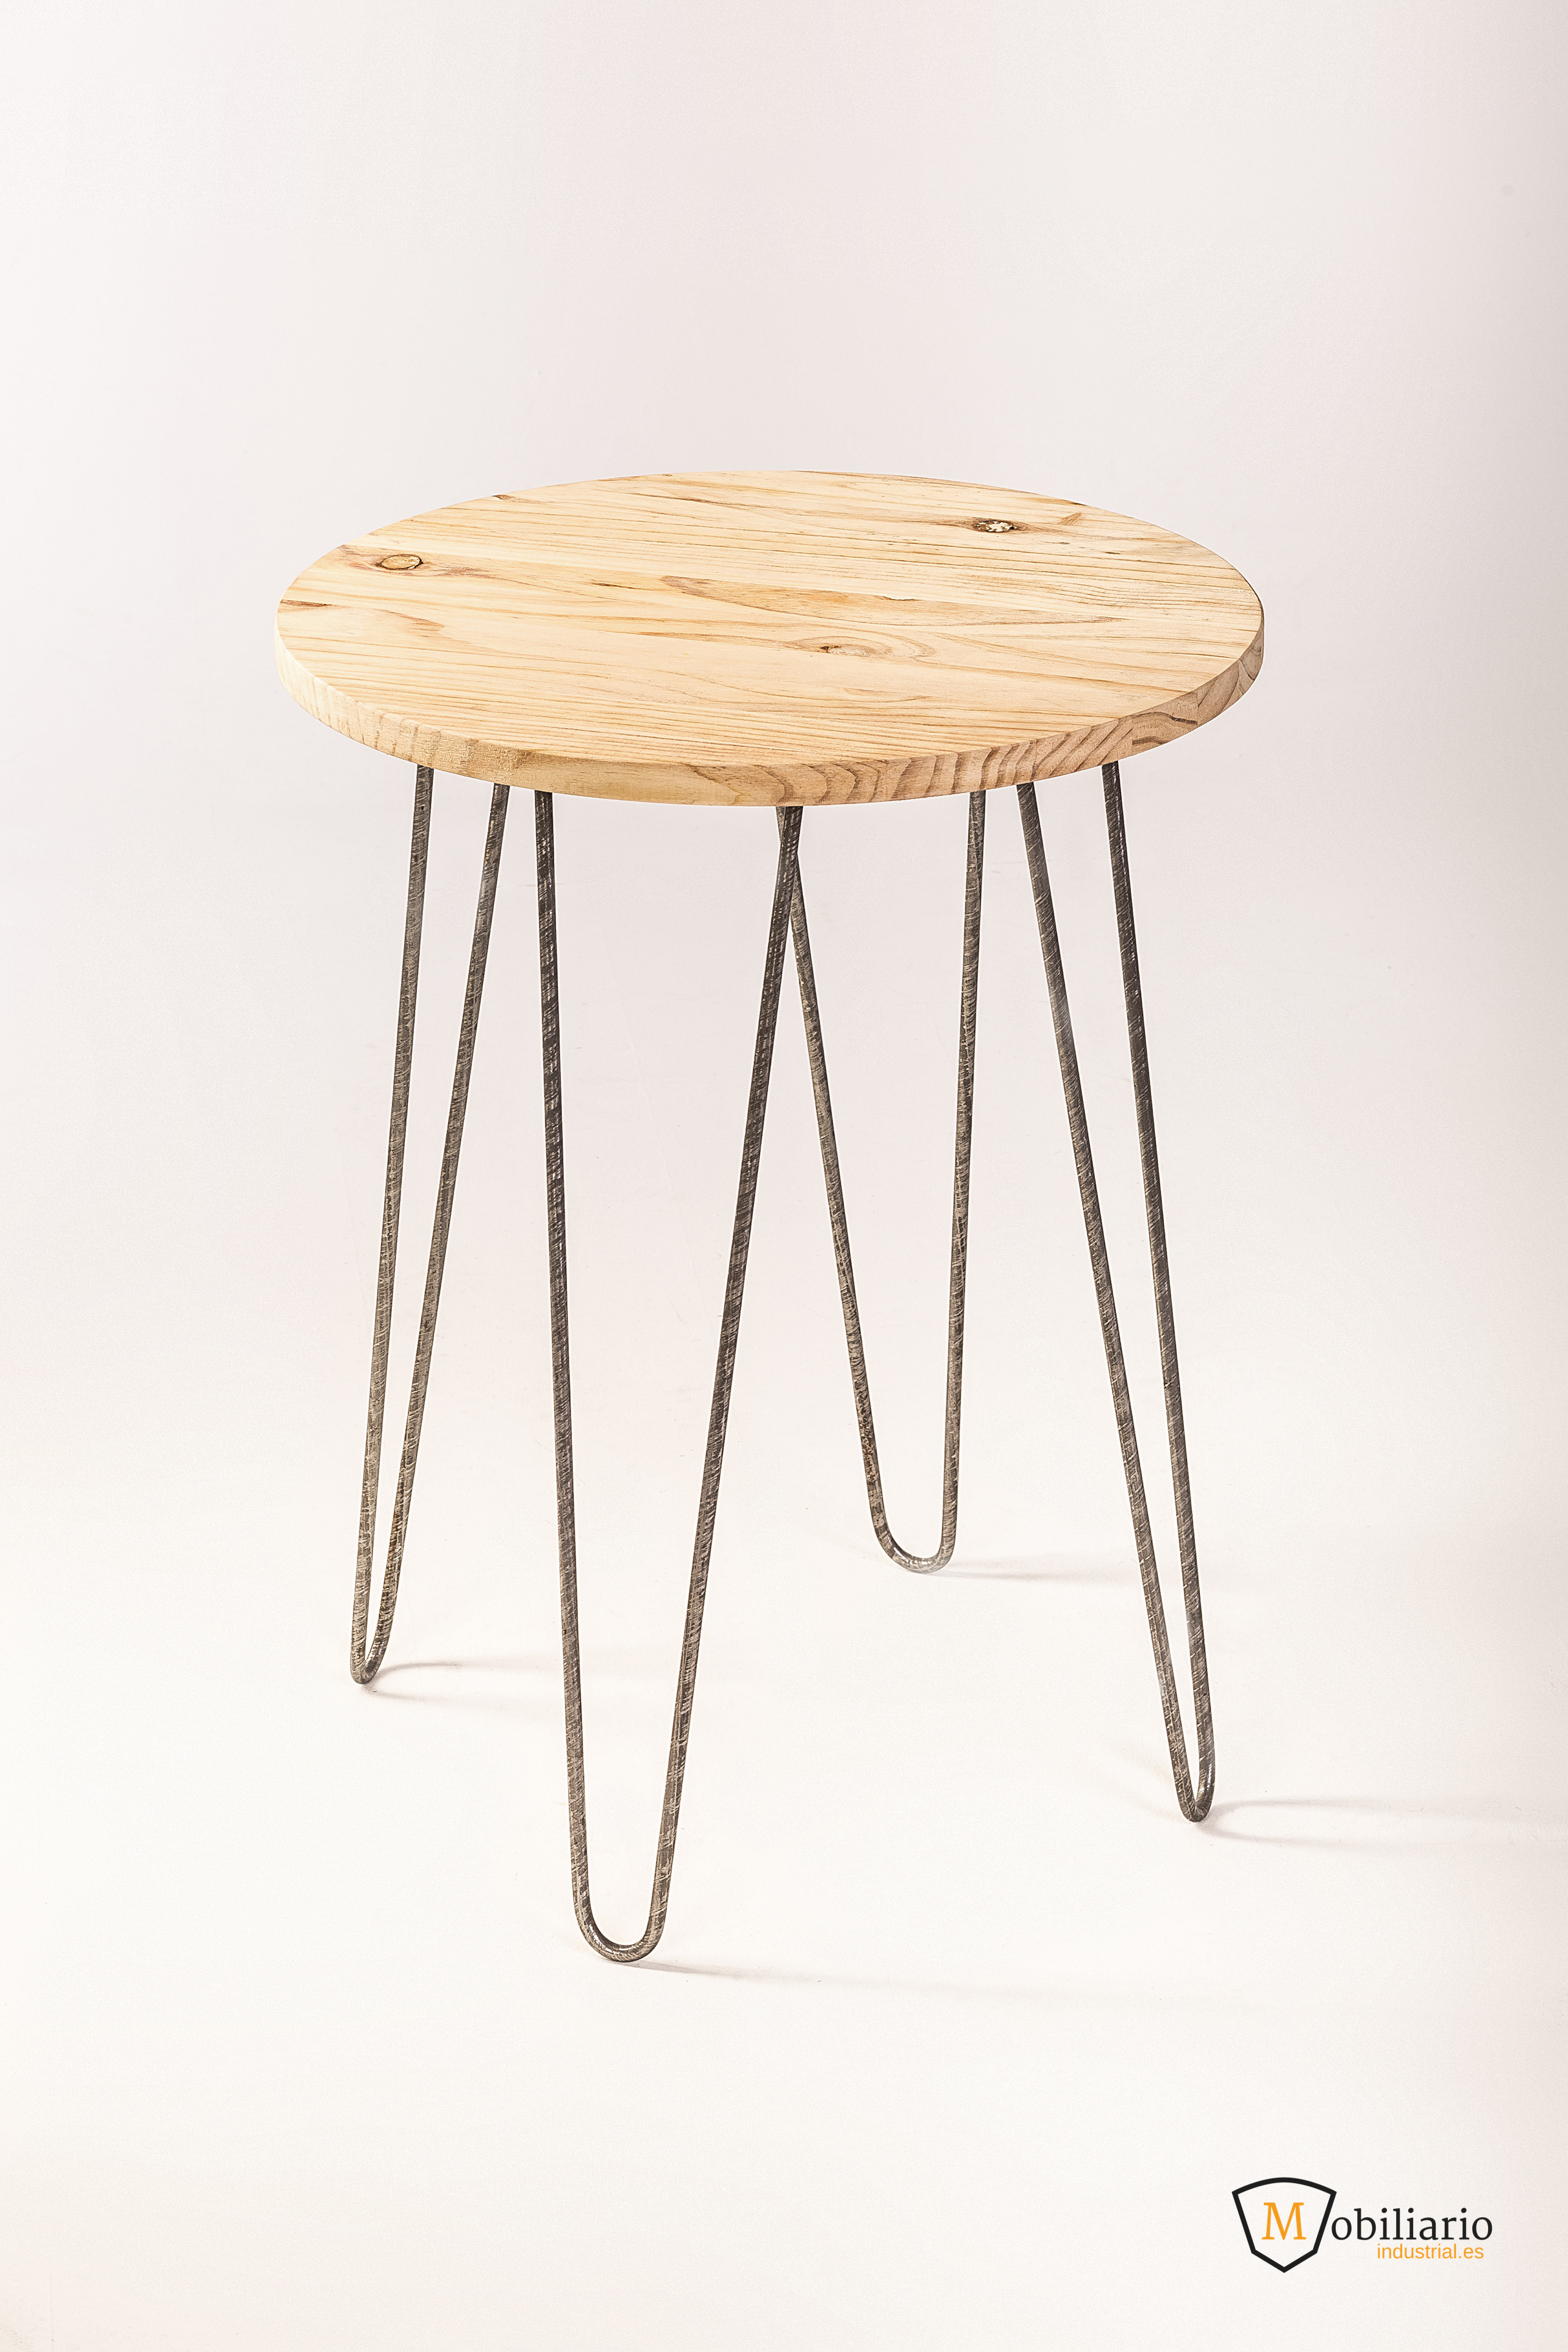 fabricar una mesa redonda